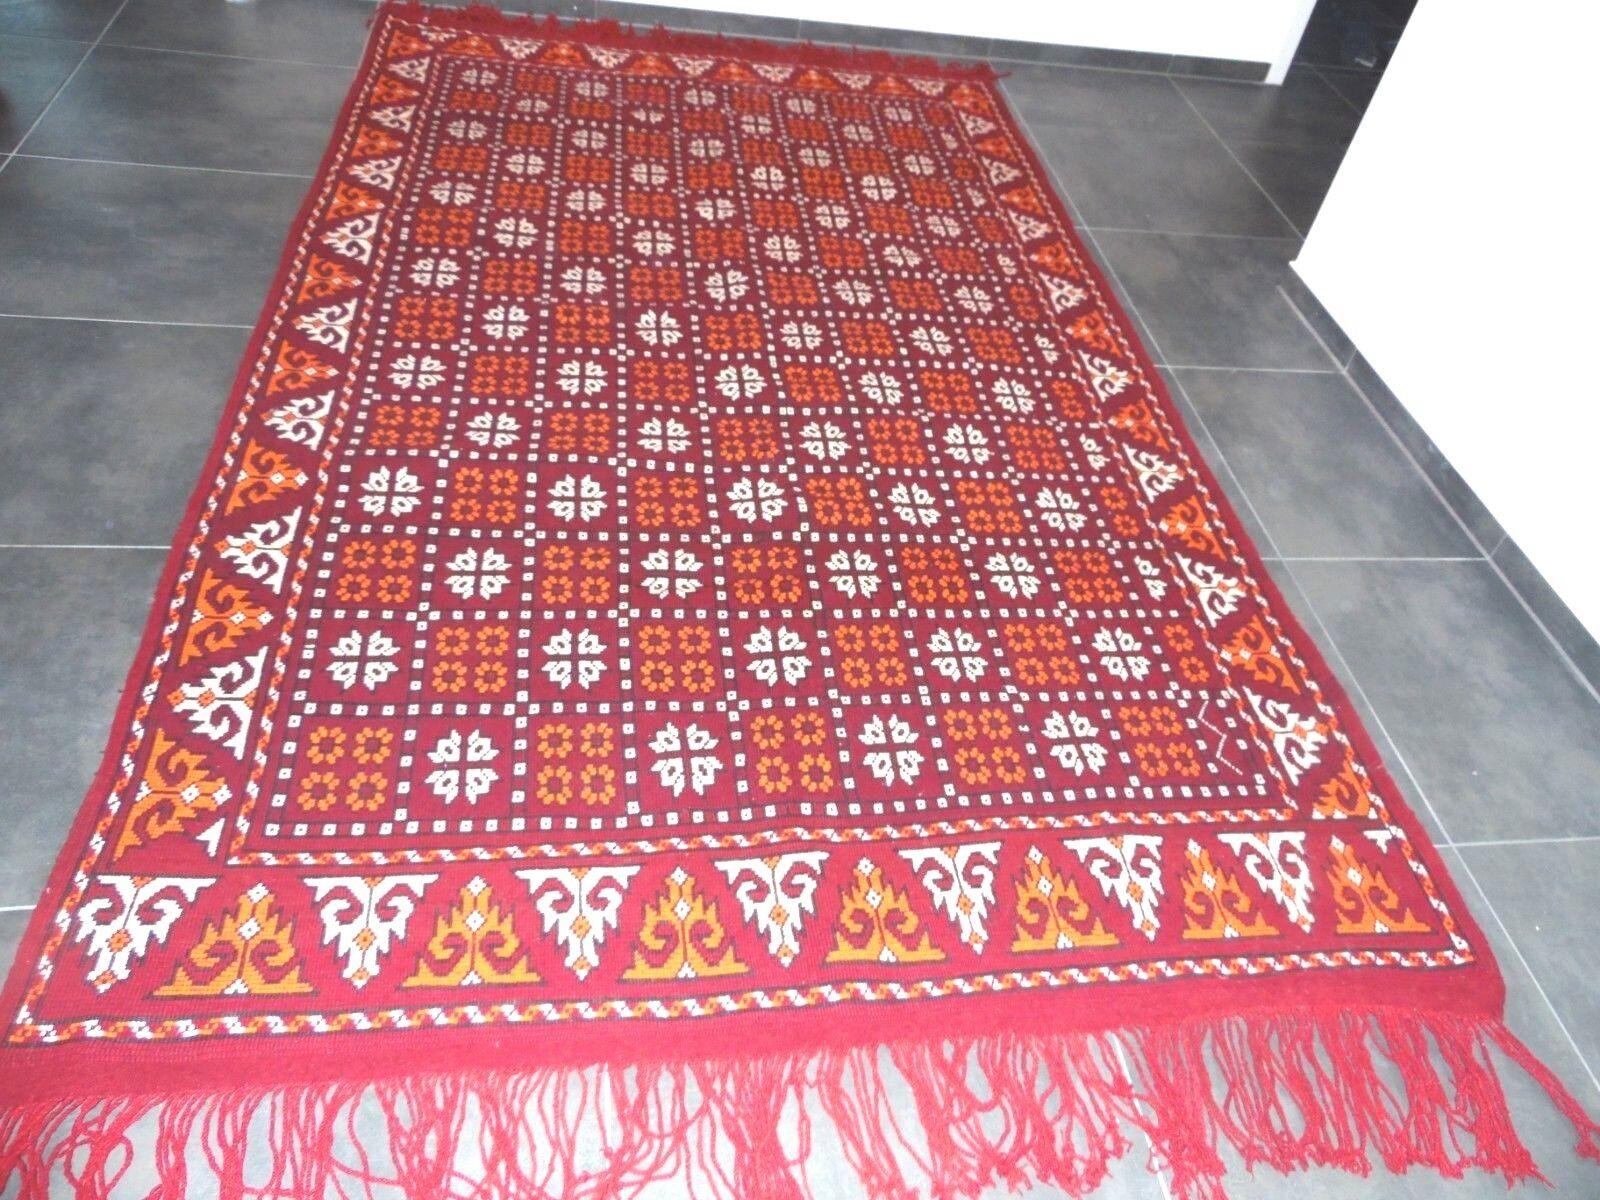 L. k. Orient alfombra de 3.2 M X 1.78 M de mano de lana virgen